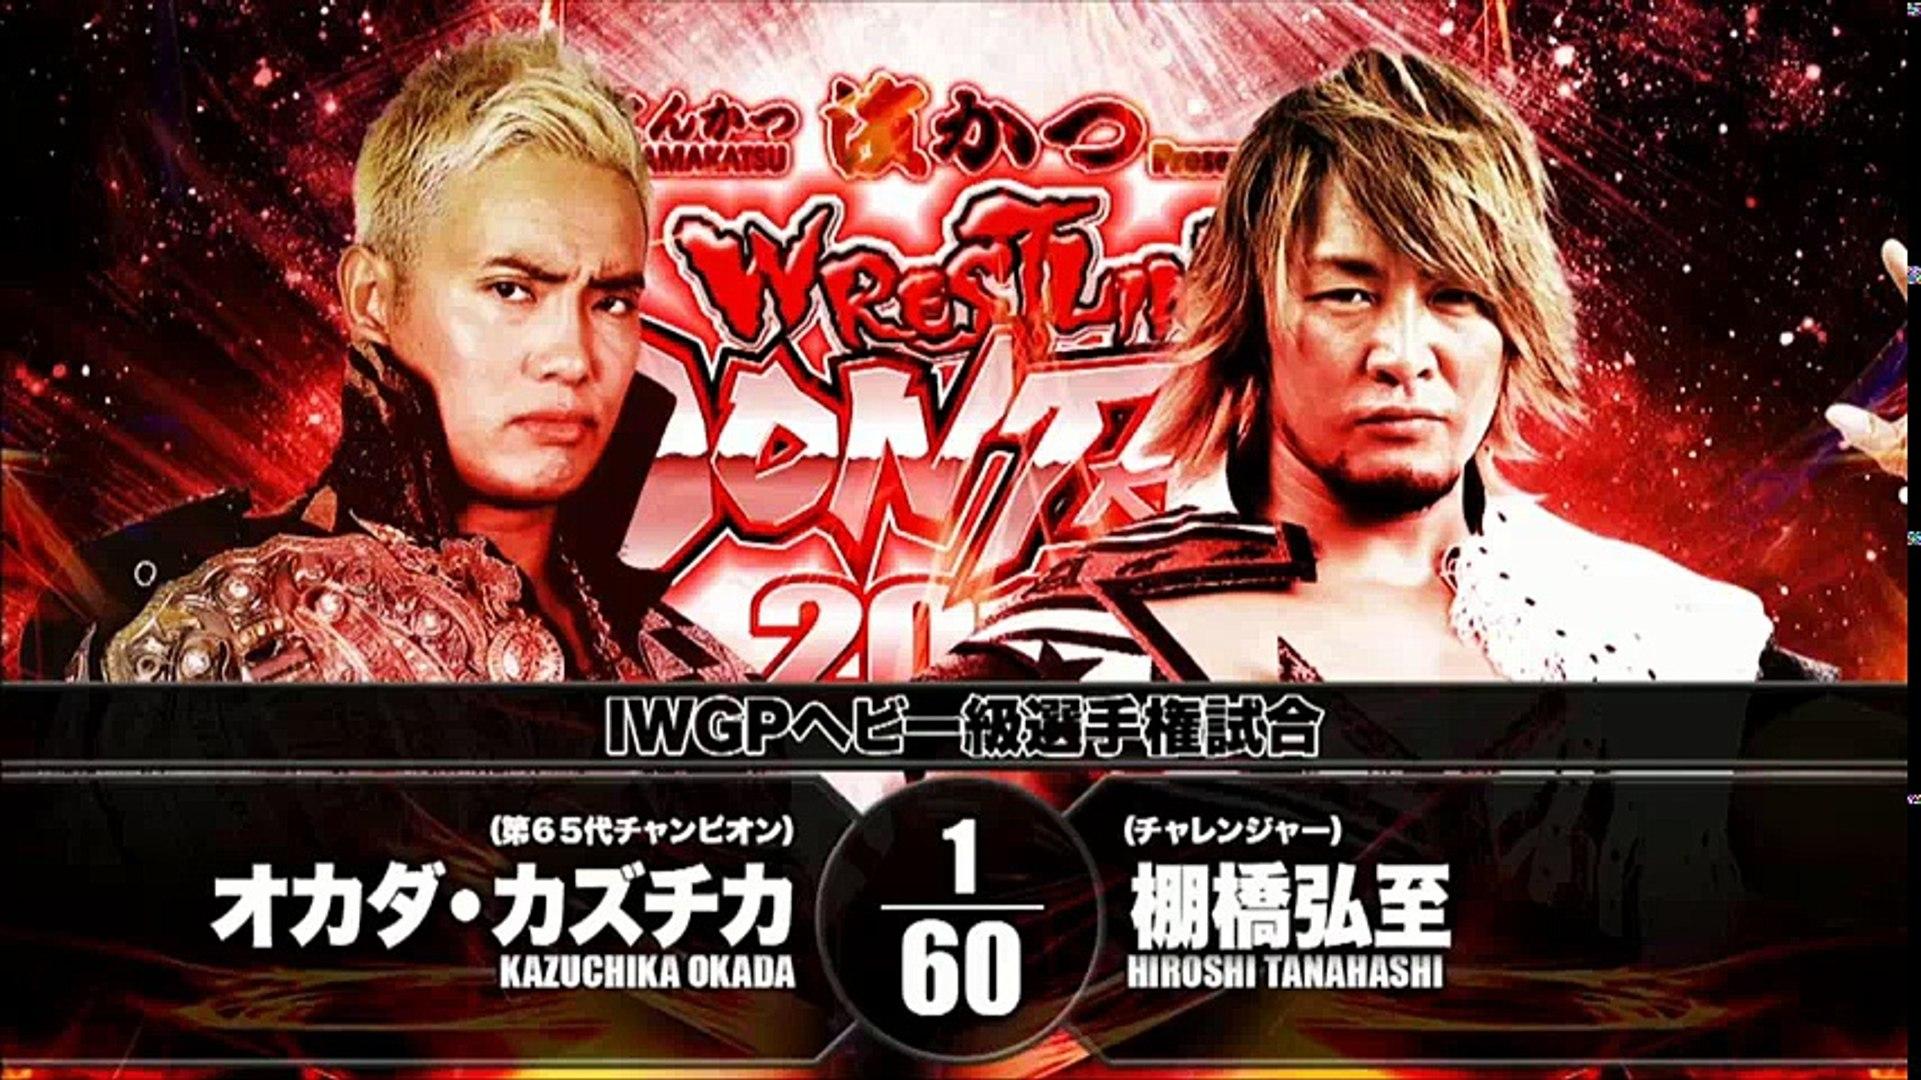 Kazuchika Okada Vs Hiroshi Tanahashi Iwgp Heavyweight Championship Wrestling Dontaku 2018